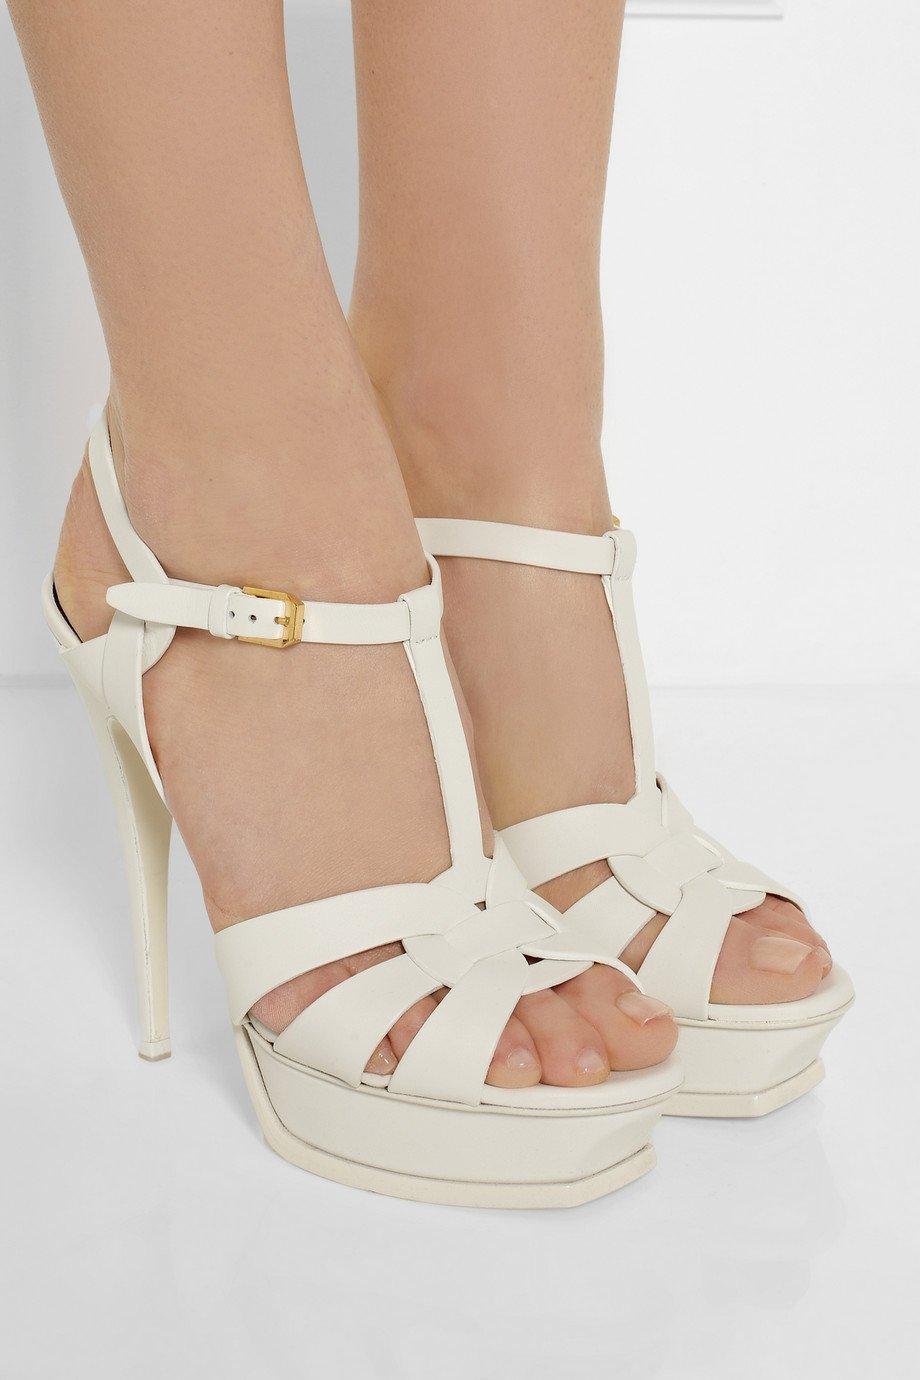 Lyst Saint Laurent Tribute Leather Platform Sandals In White